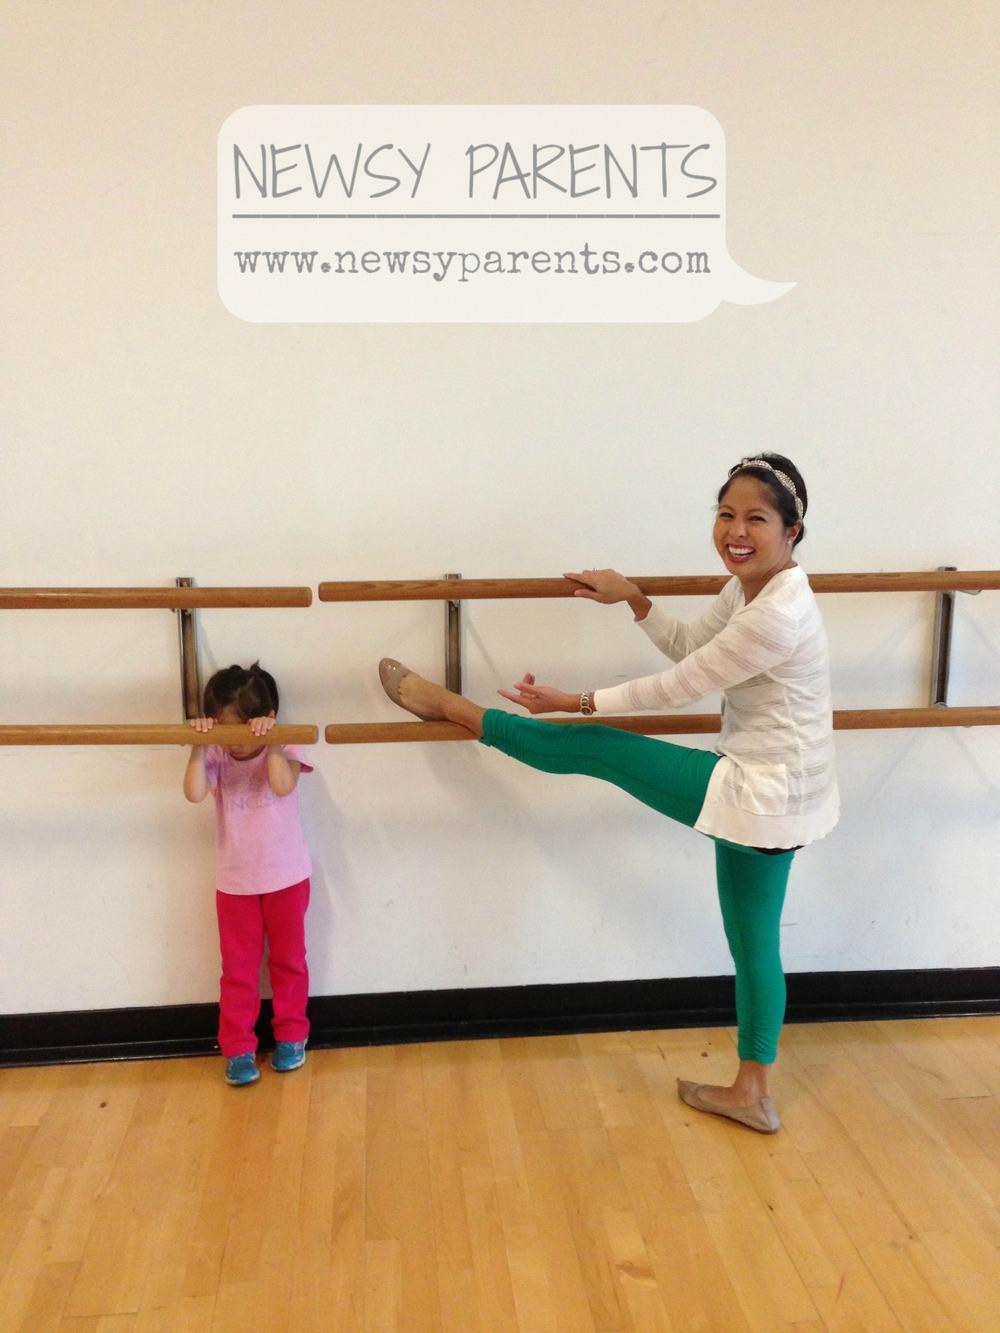 Newsy Parents Rockettes kick class barre